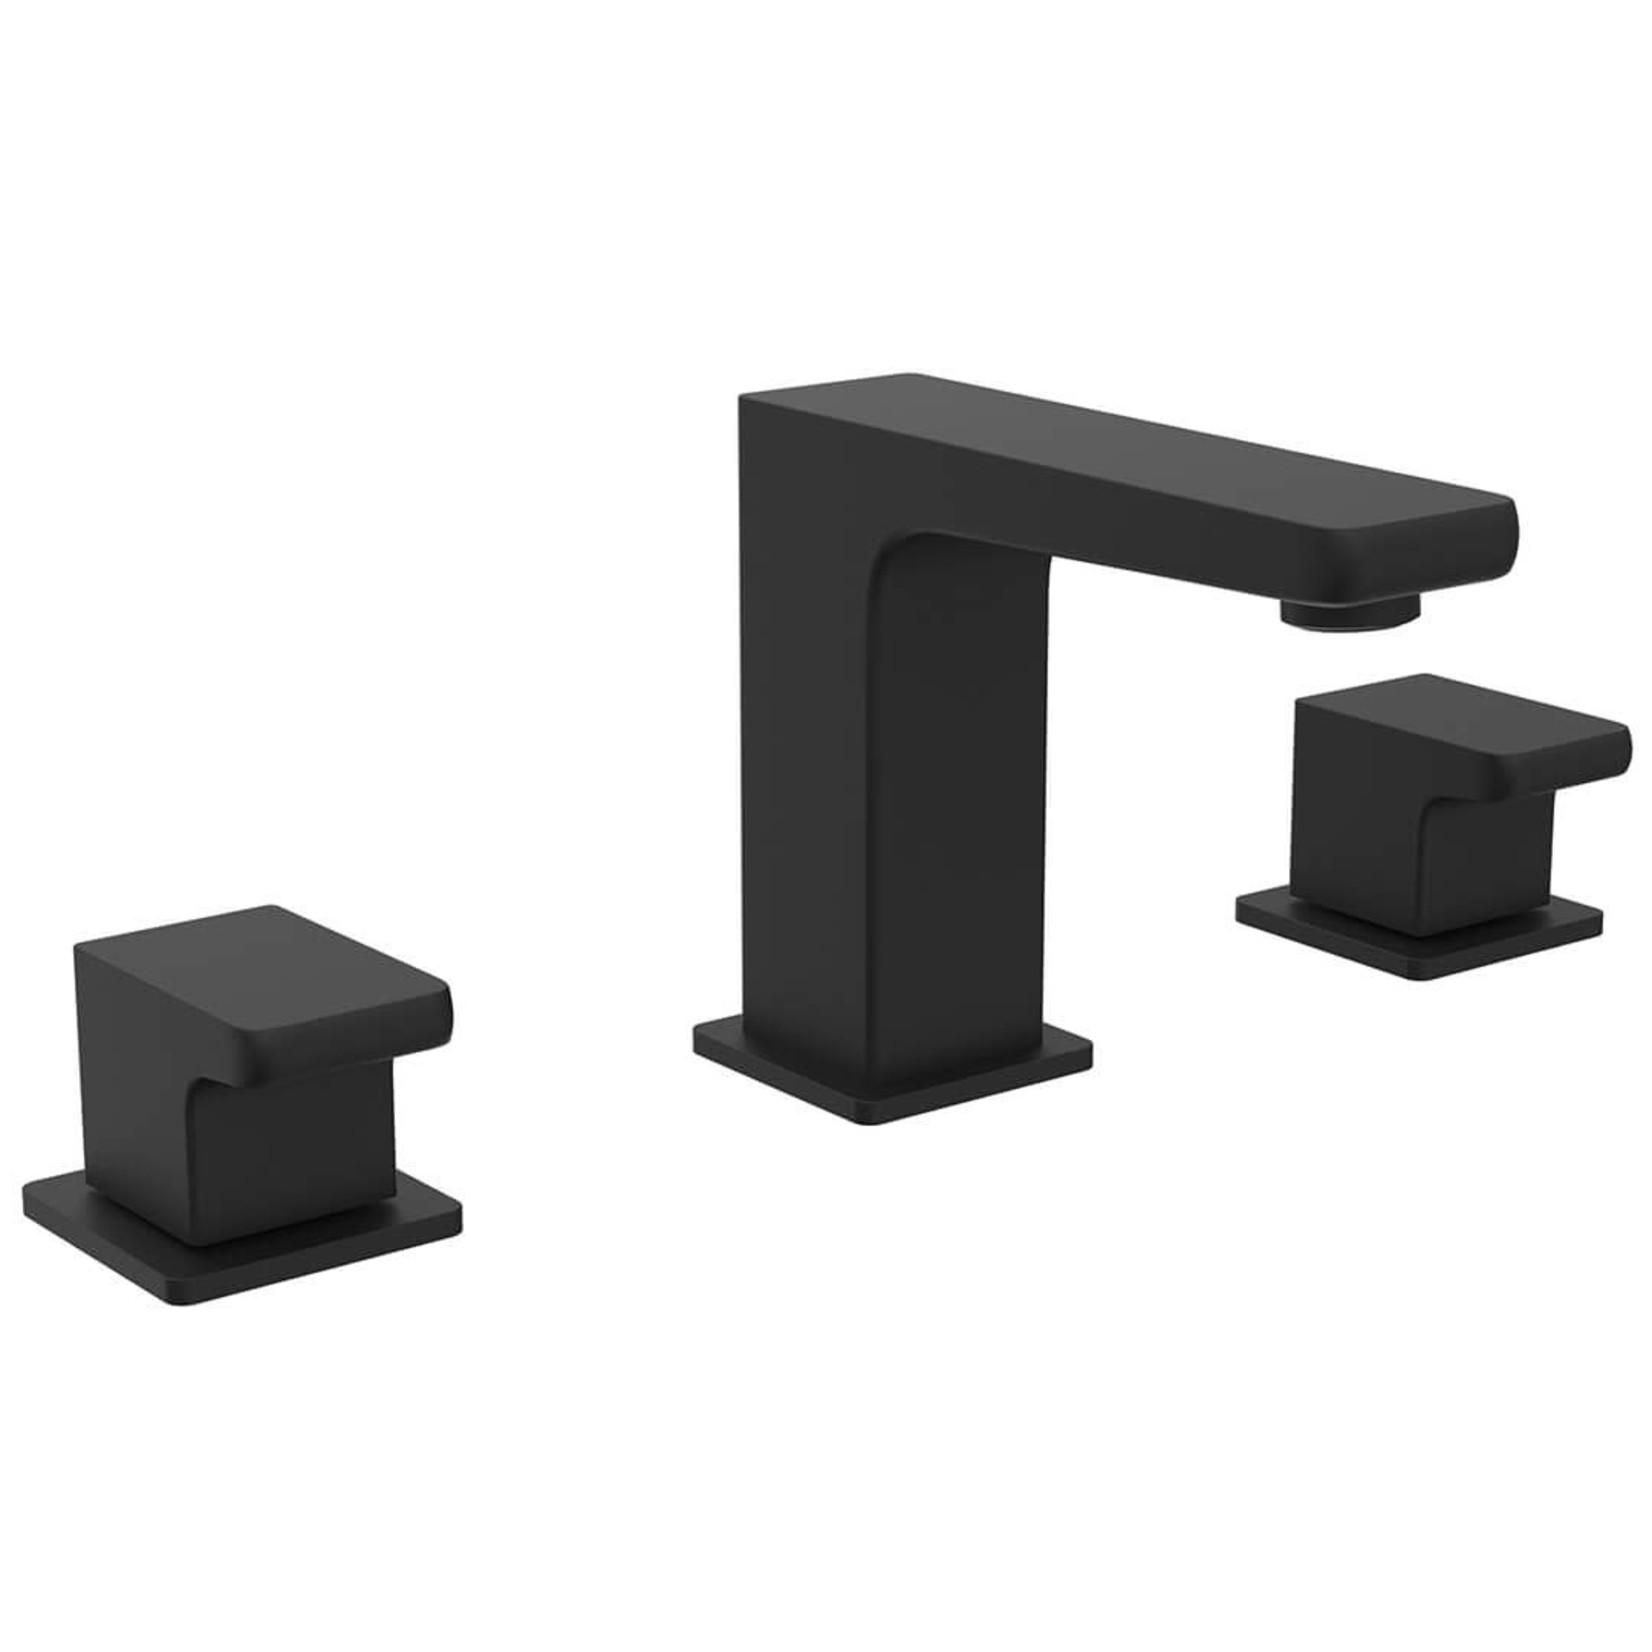 Robinet de lavabo Noir Mat  jade bath 8602-03-11